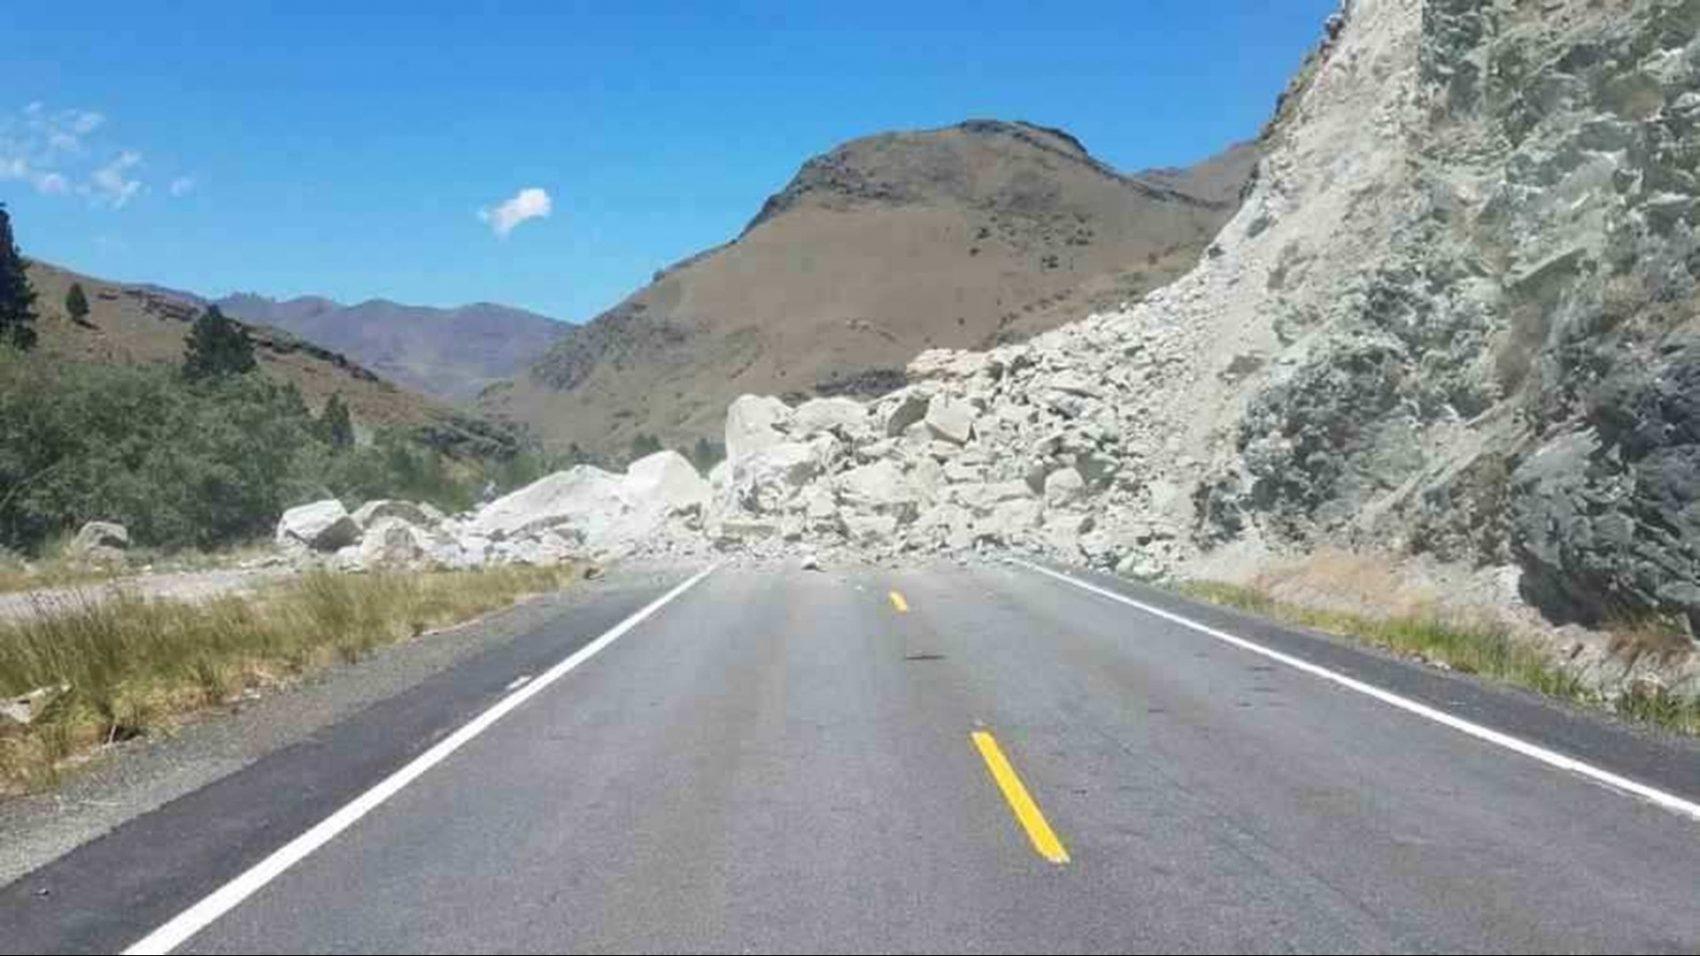 Rocks 20 feet deep close road